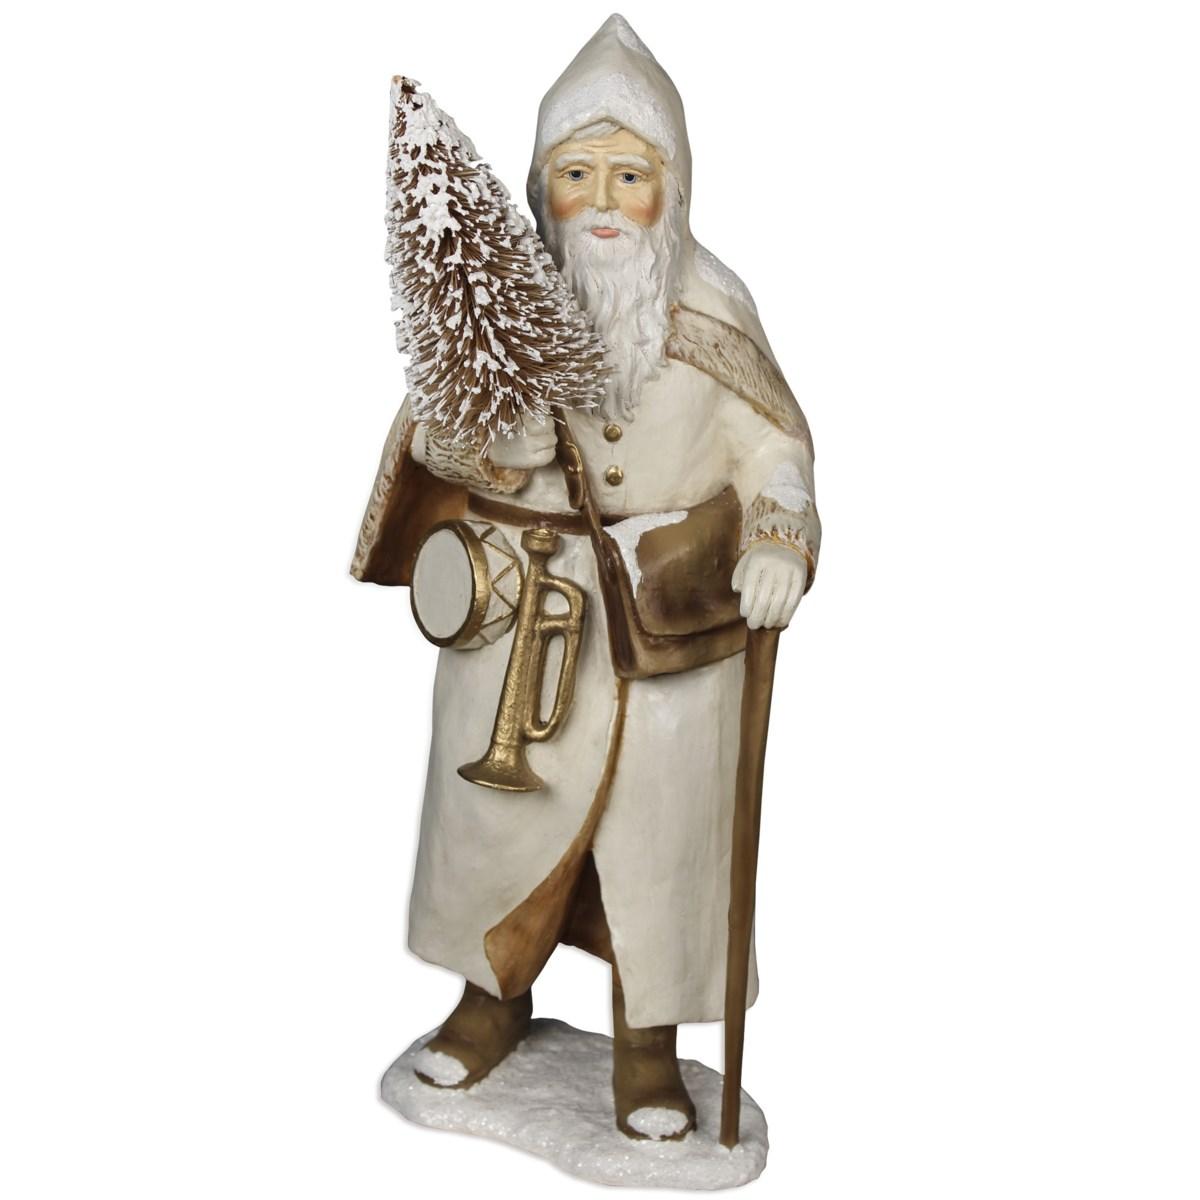 Ivory St. Nick With Walking Stick